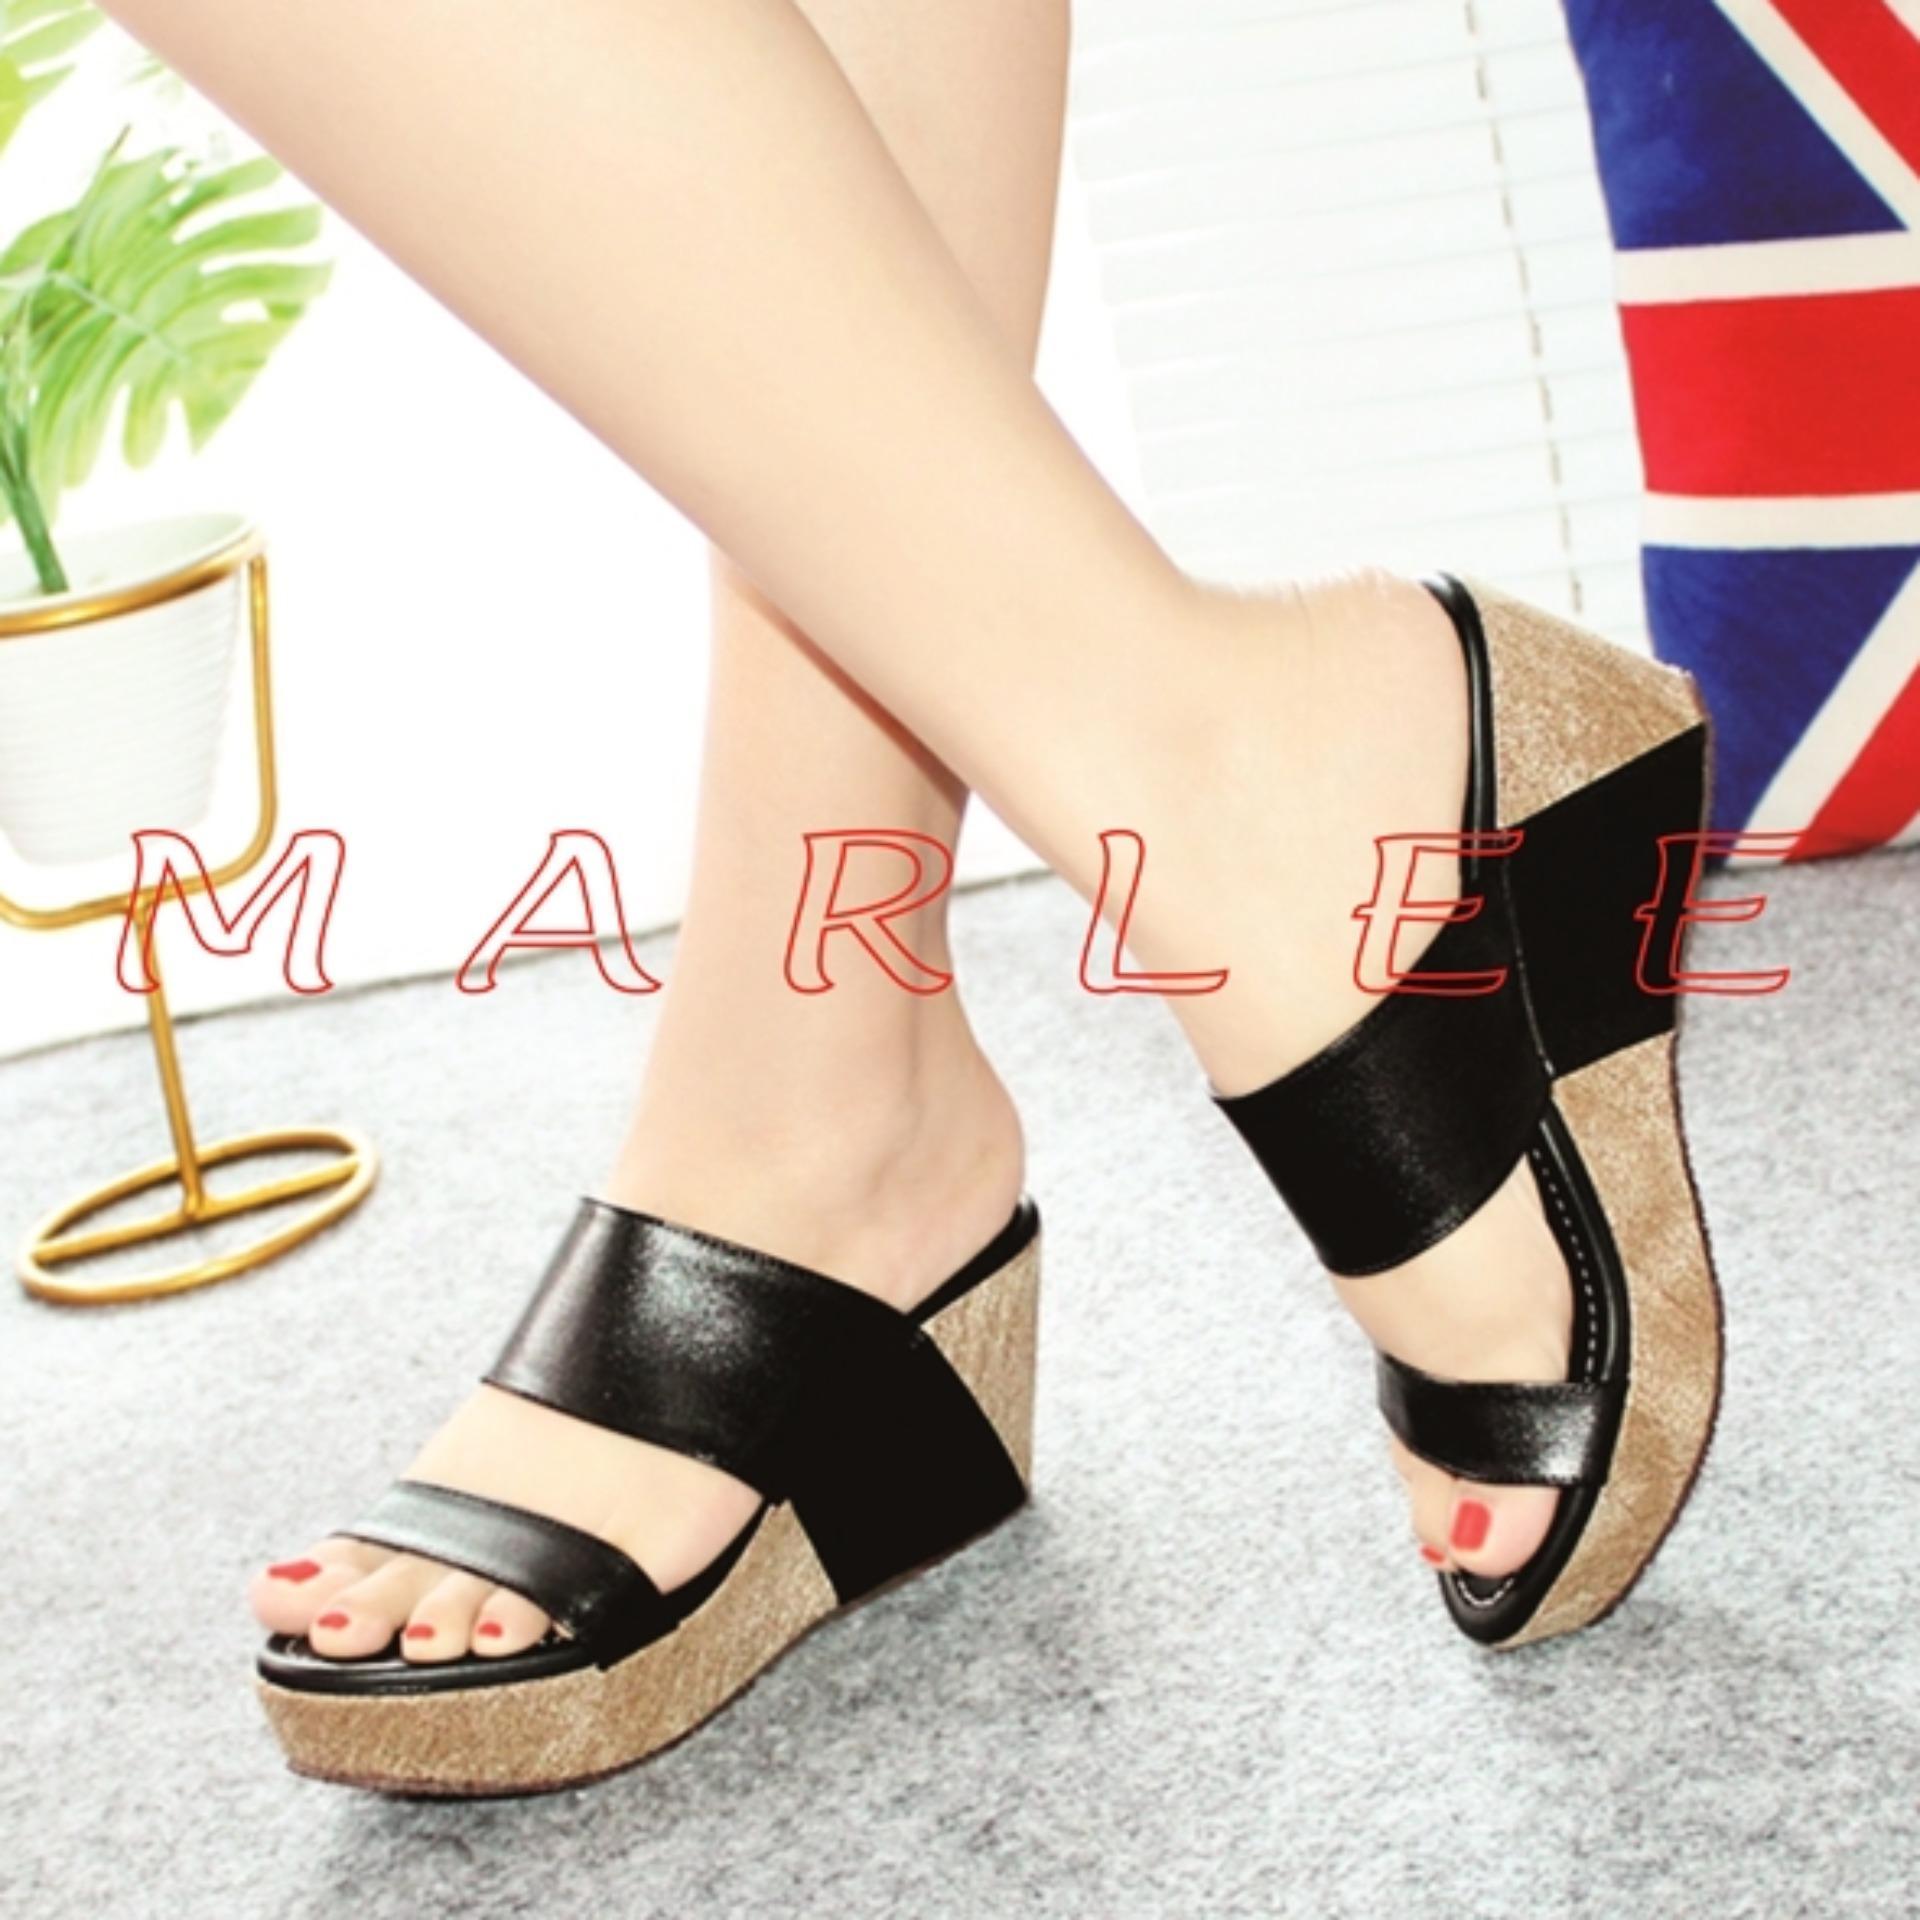 Hanna Marlee Wedges Sandal HM-02 Hitam .